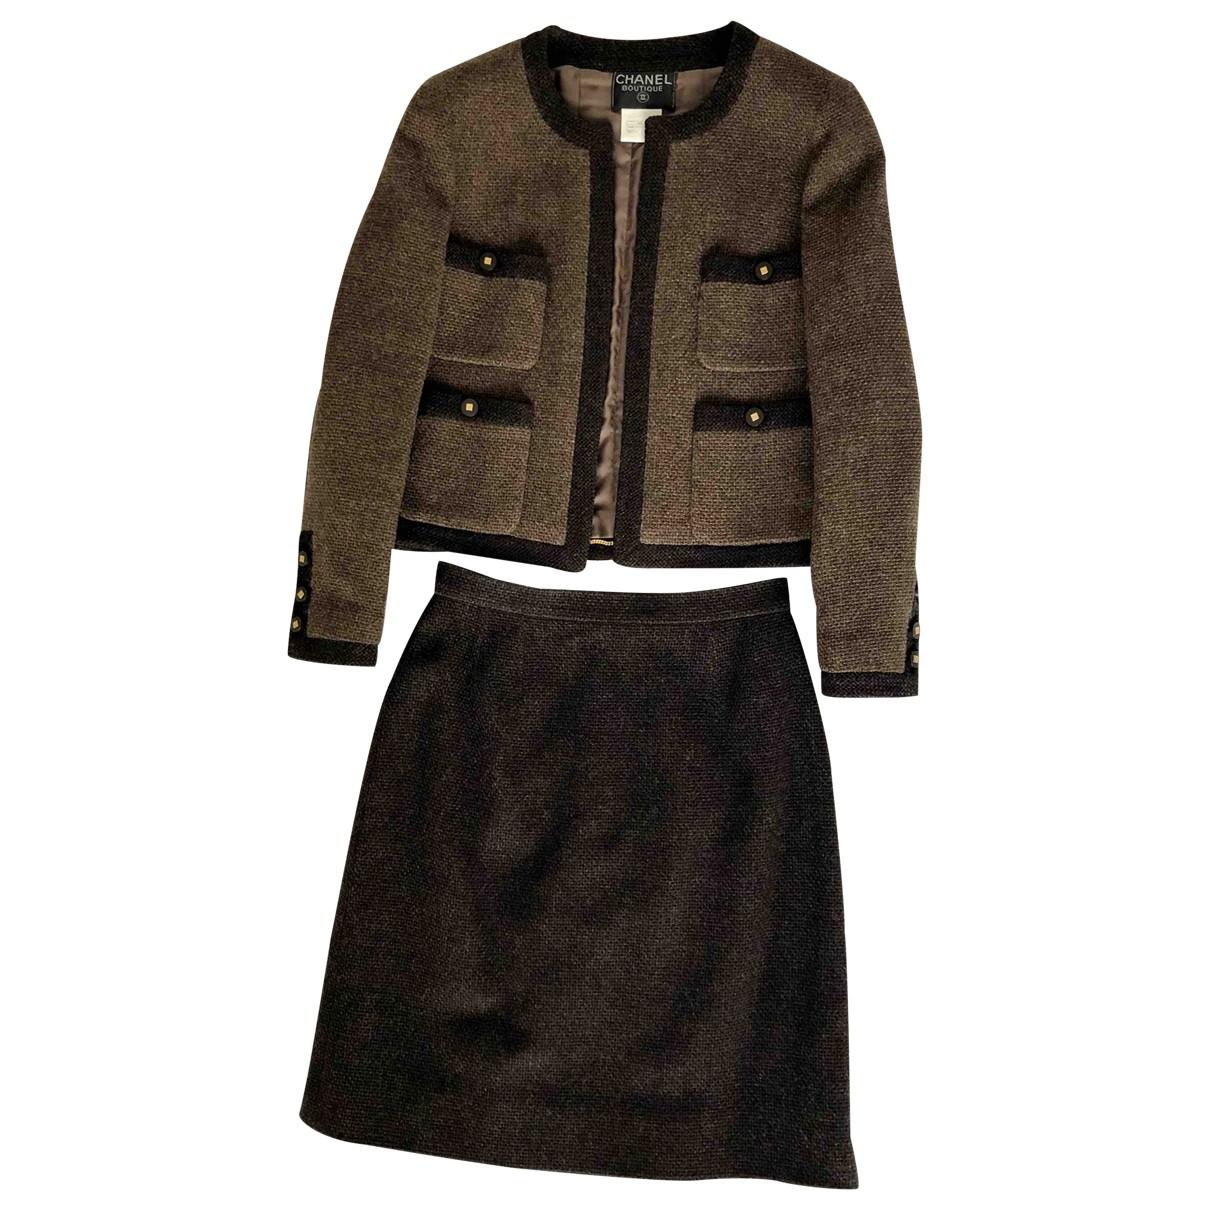 Chanel \N Brown Wool jacket for Women 42 FR